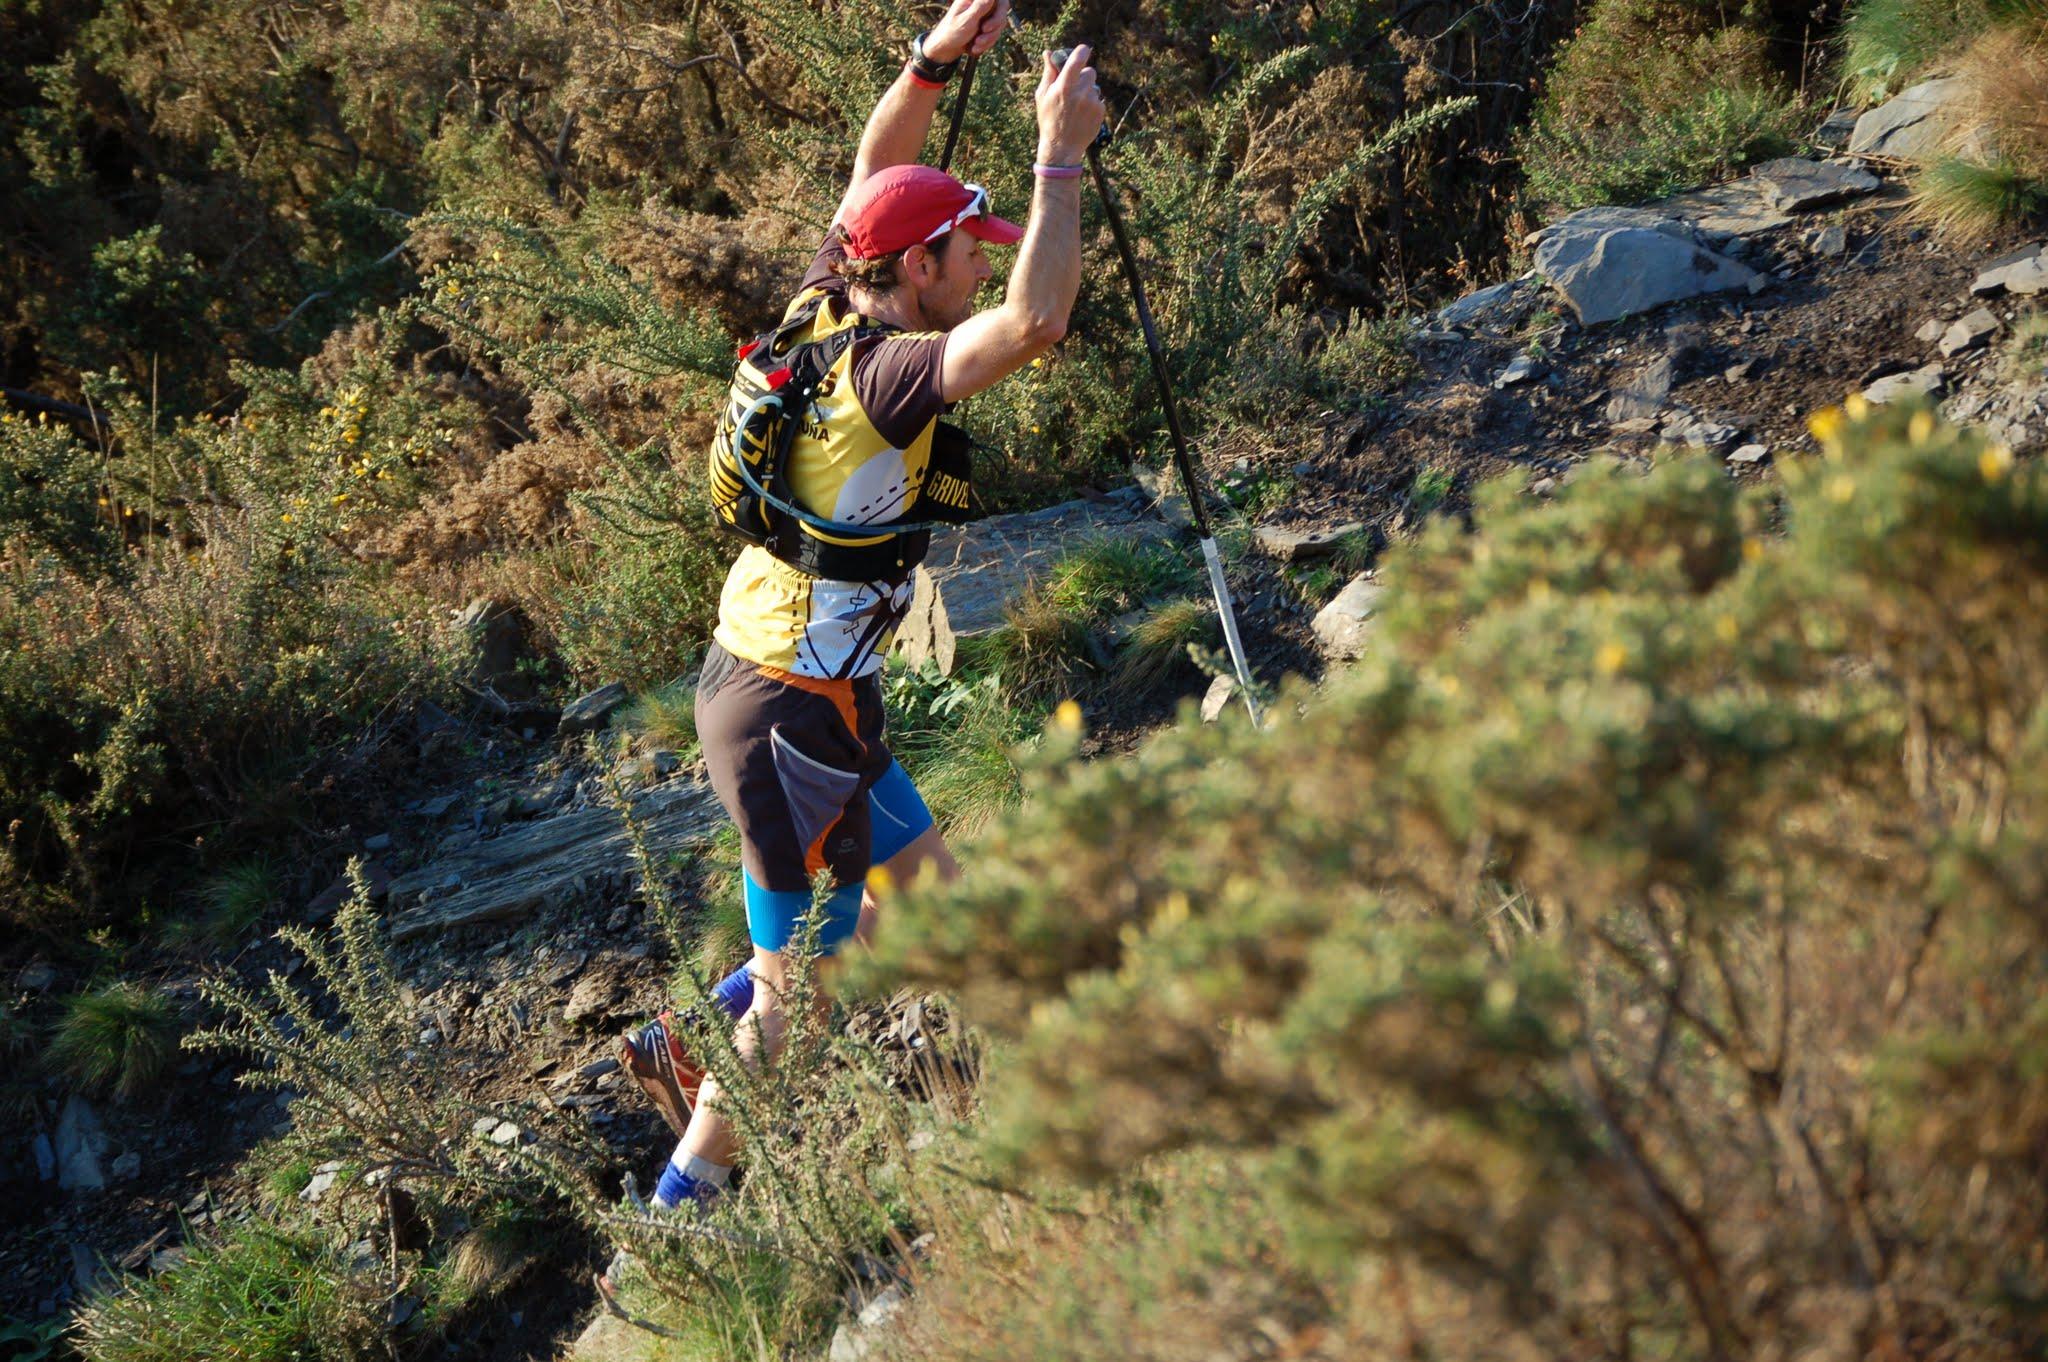 Este domingo se disputa la segunda prueba de la Copa de España de Carreras por Montaña en Línea - GP BUFF®-Salomon en CAMOVI